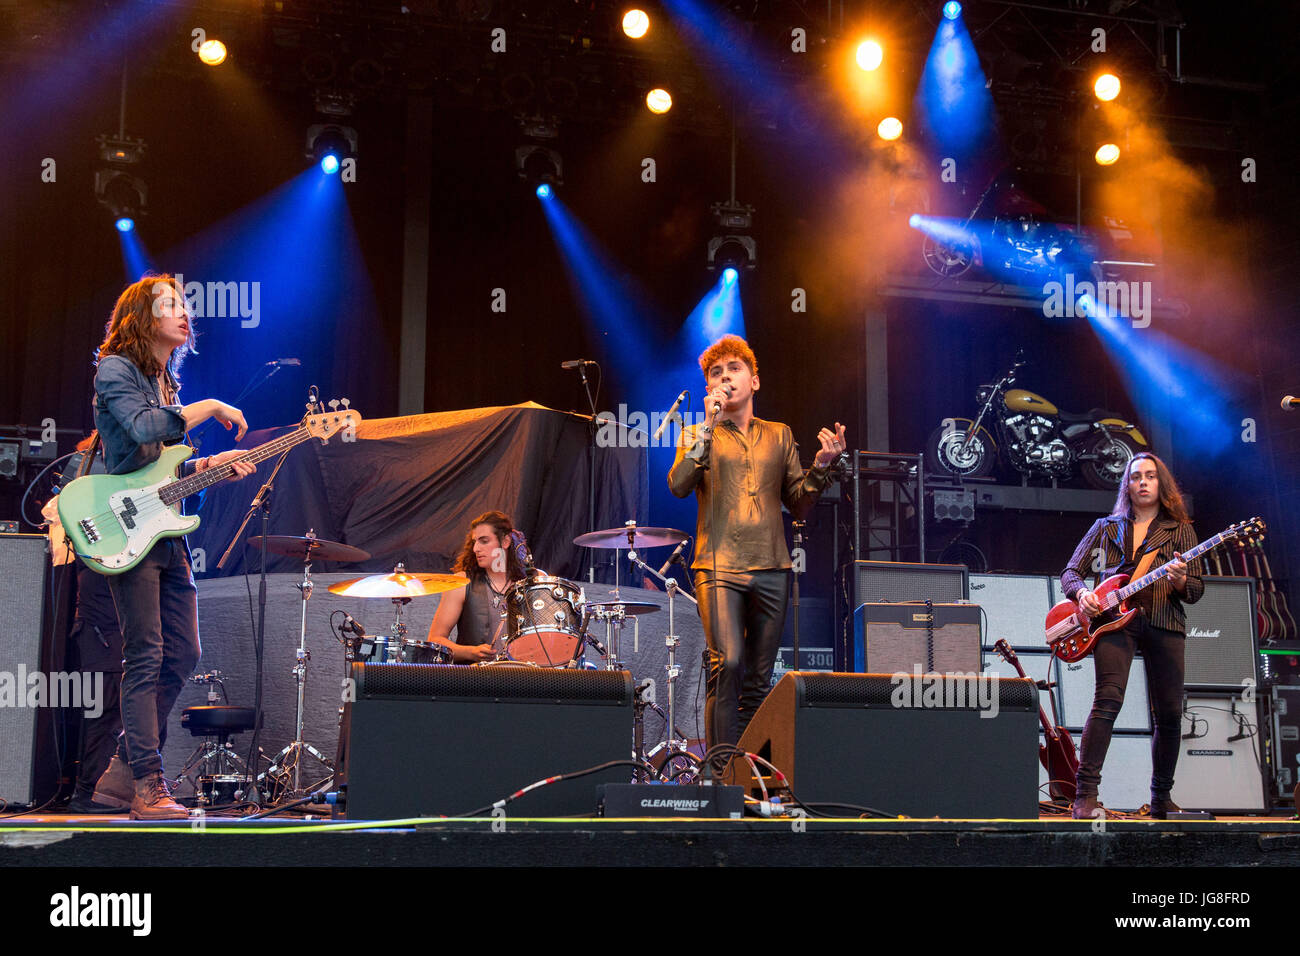 Artist  Summerfest The Worlds Largest Music Festival